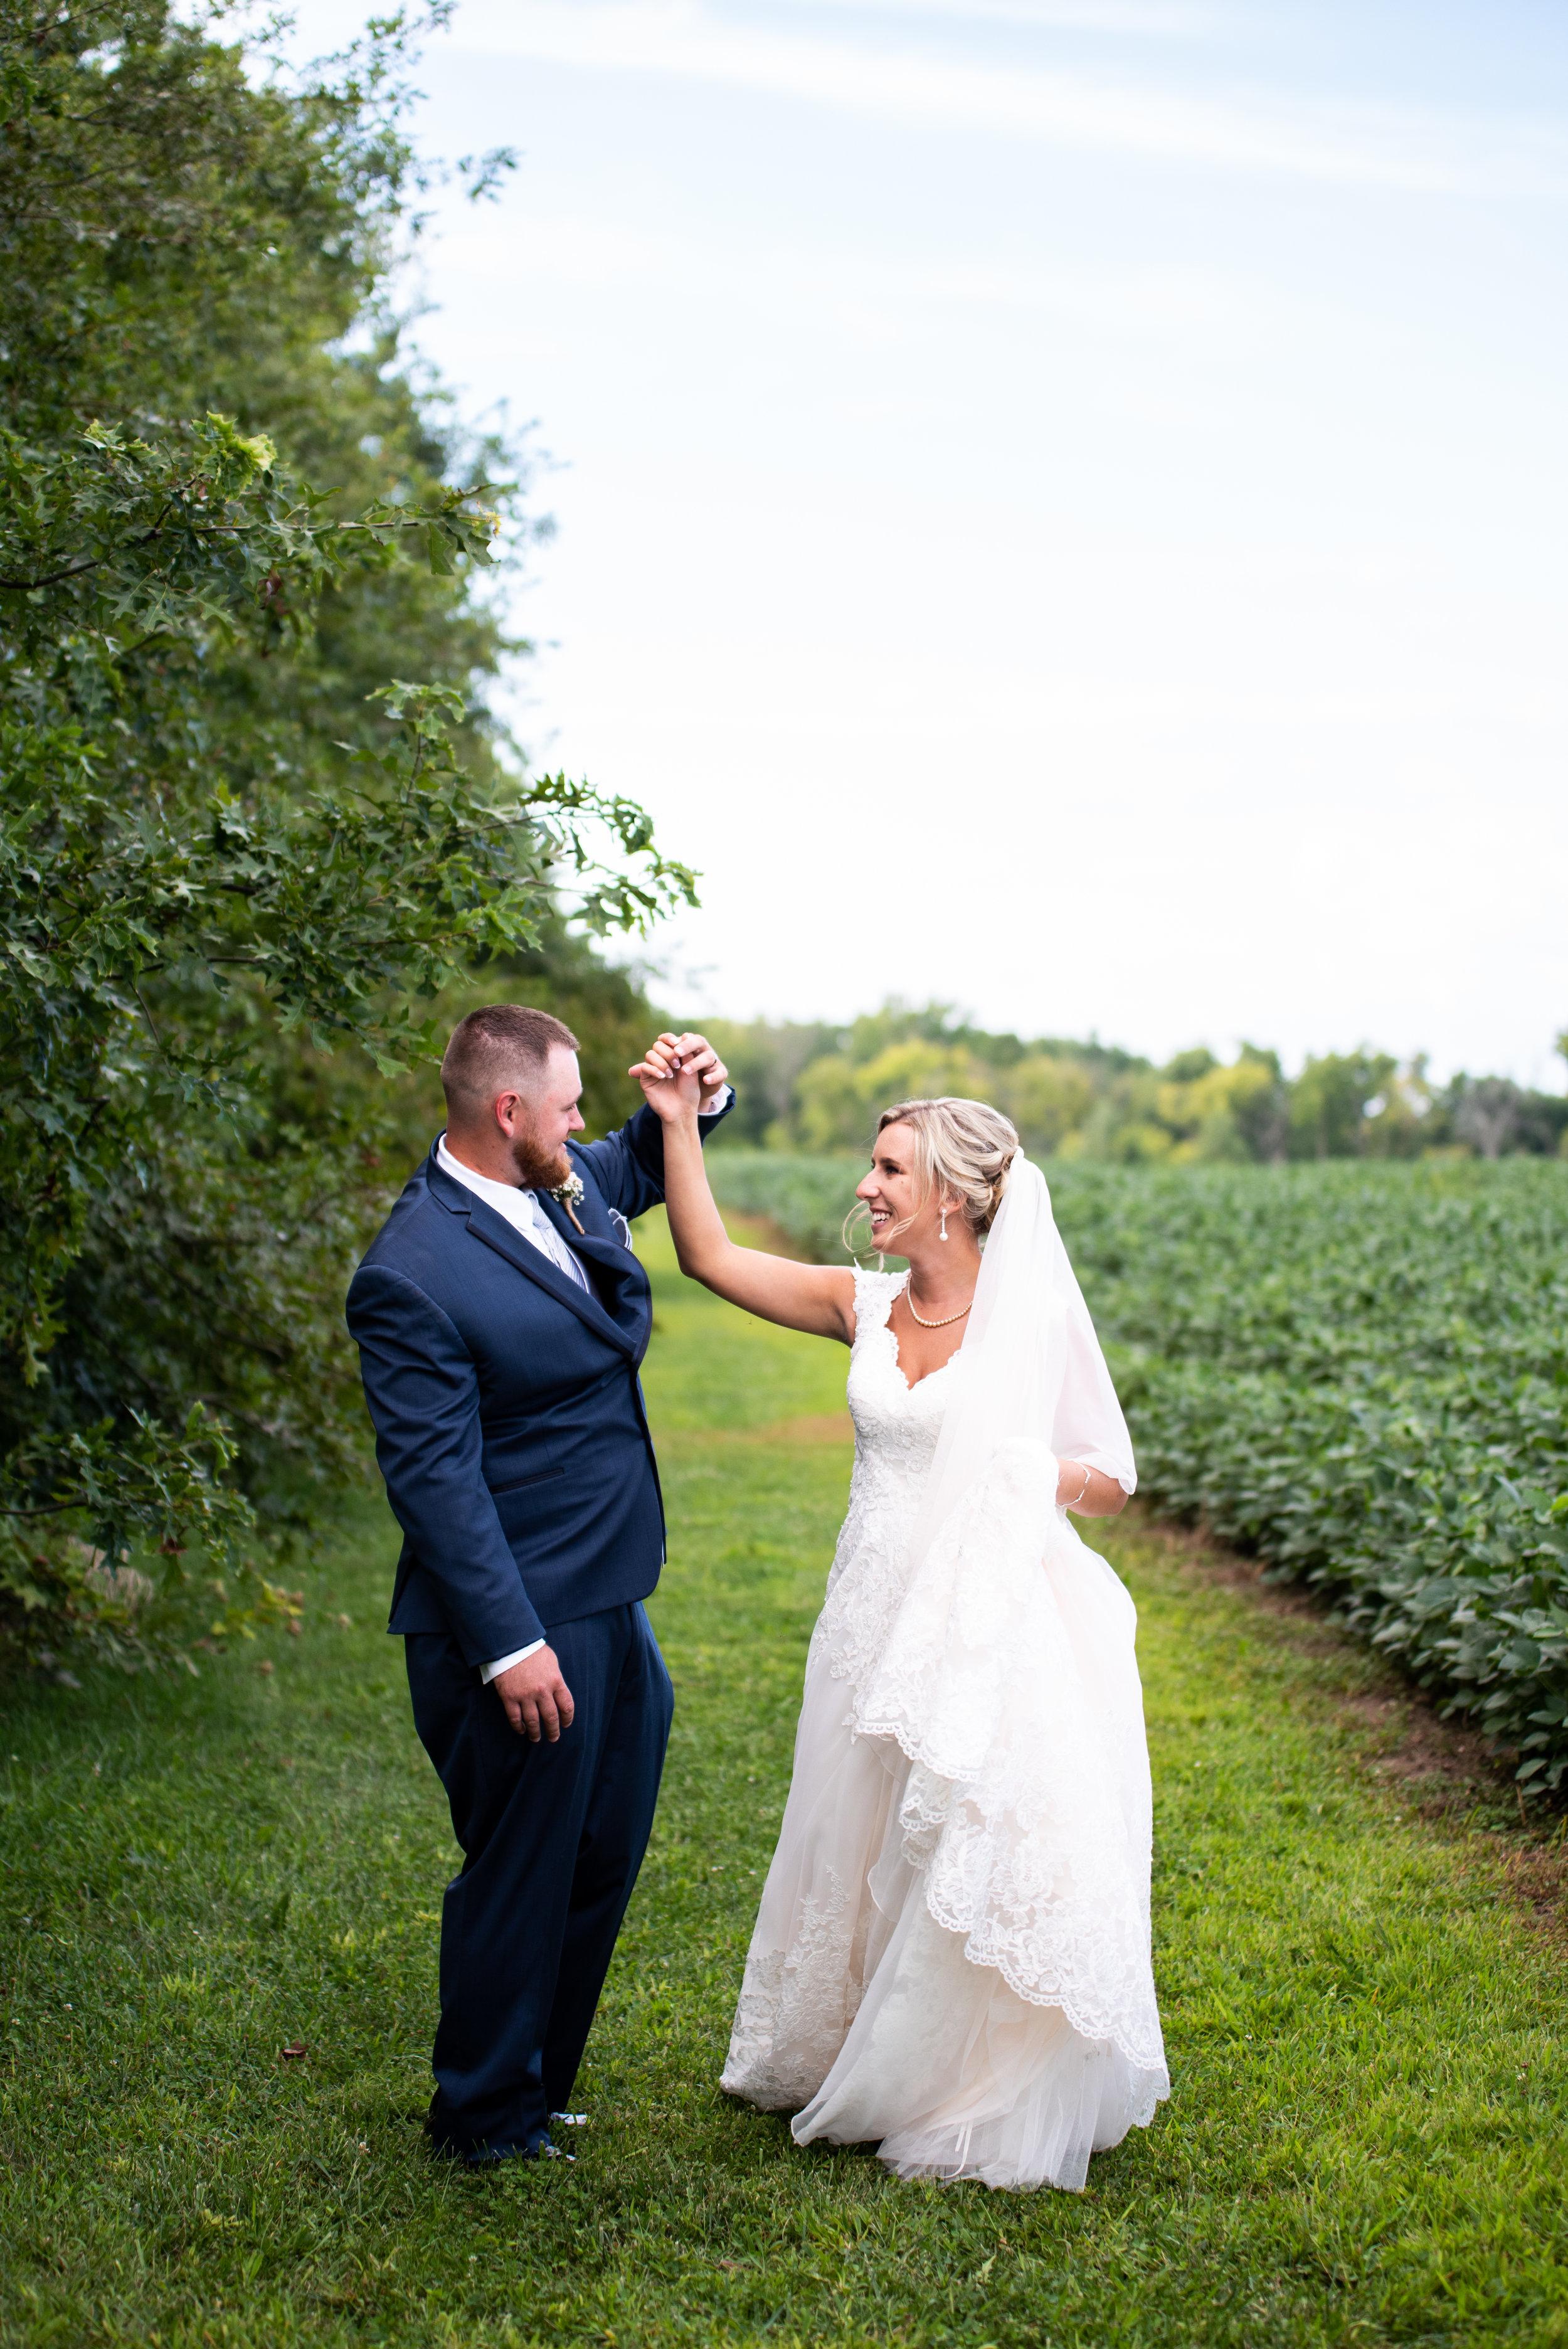 wedding (1 of 1)-160.jpg